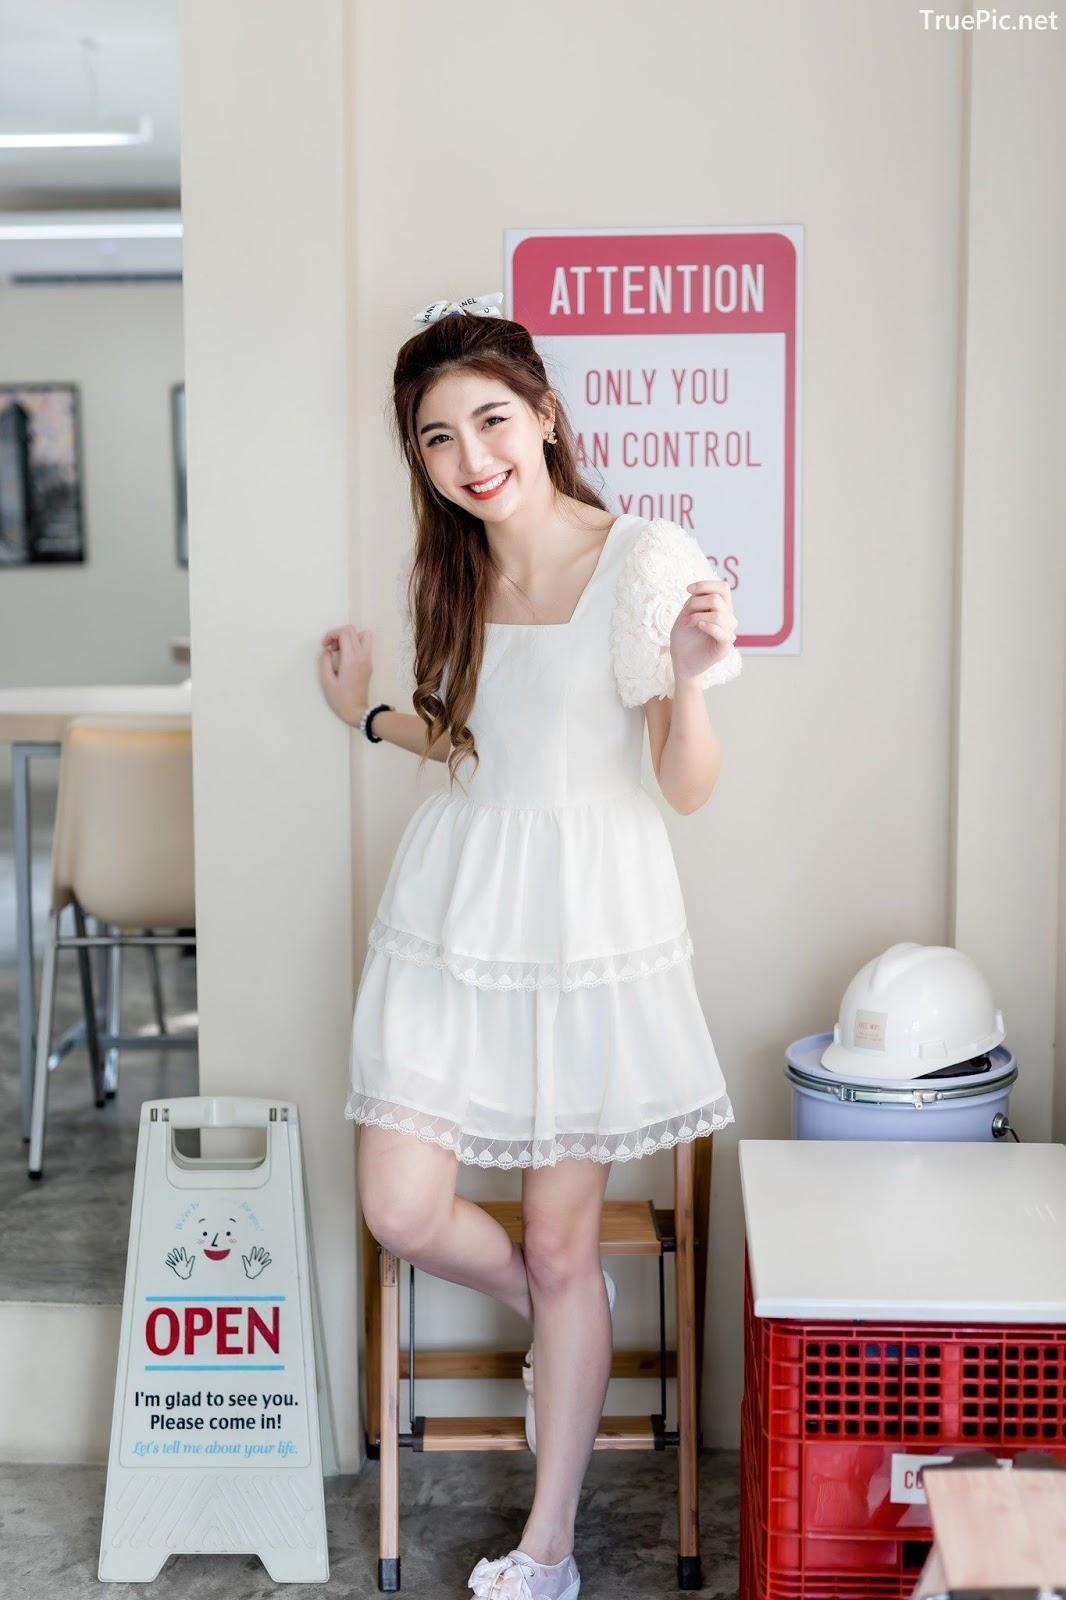 Image Thailand Model - Sasi Ngiunwan - Barbie Doll Smile - TruePic.net - Picture-8